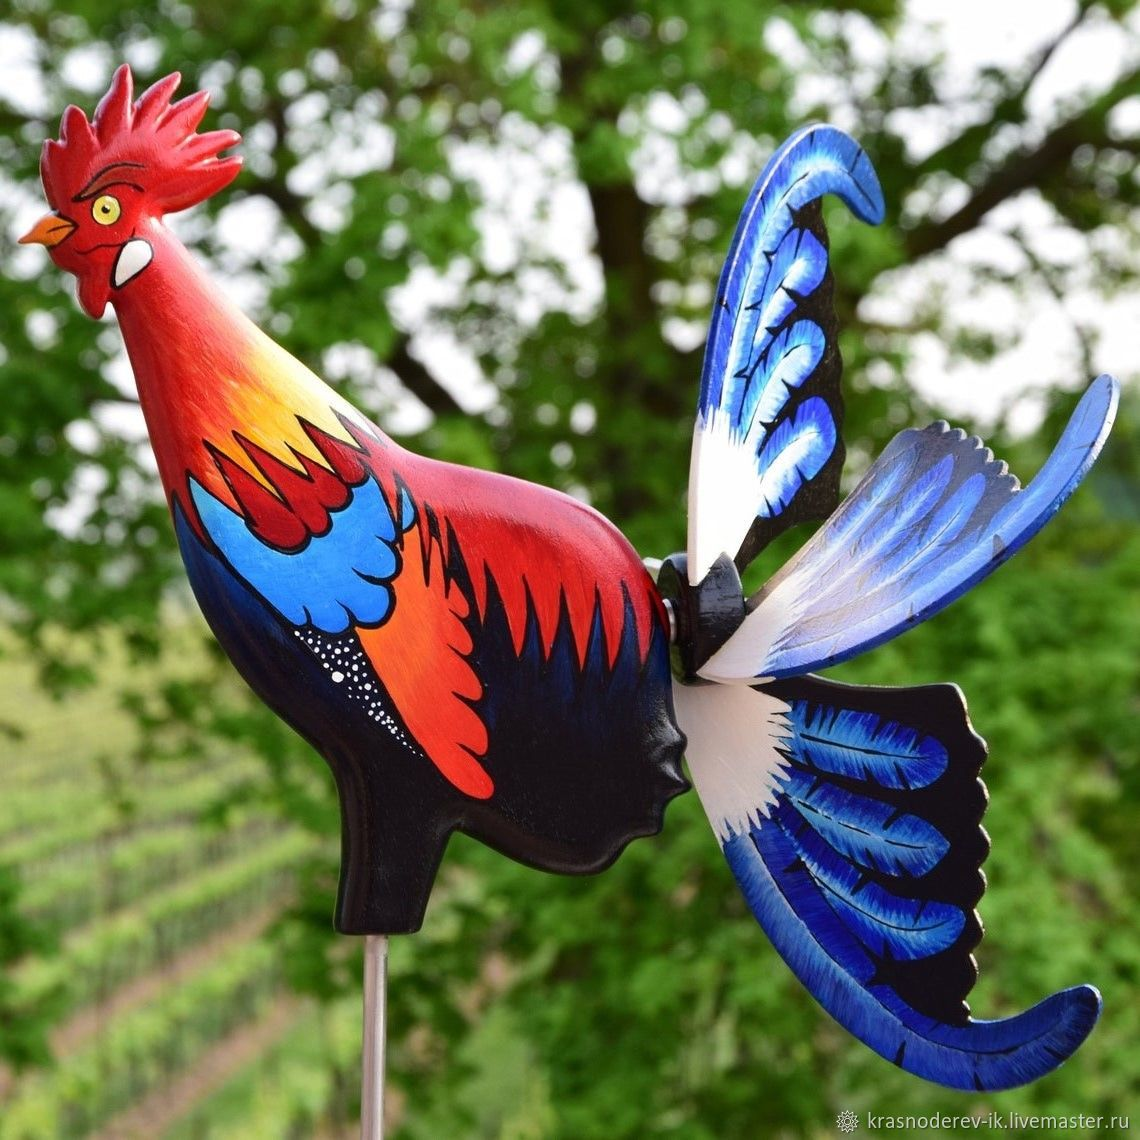 Флюгер Вертушка  забавная птица красивый  Петух, Флюгер, Санкт-Петербург,  Фото №1